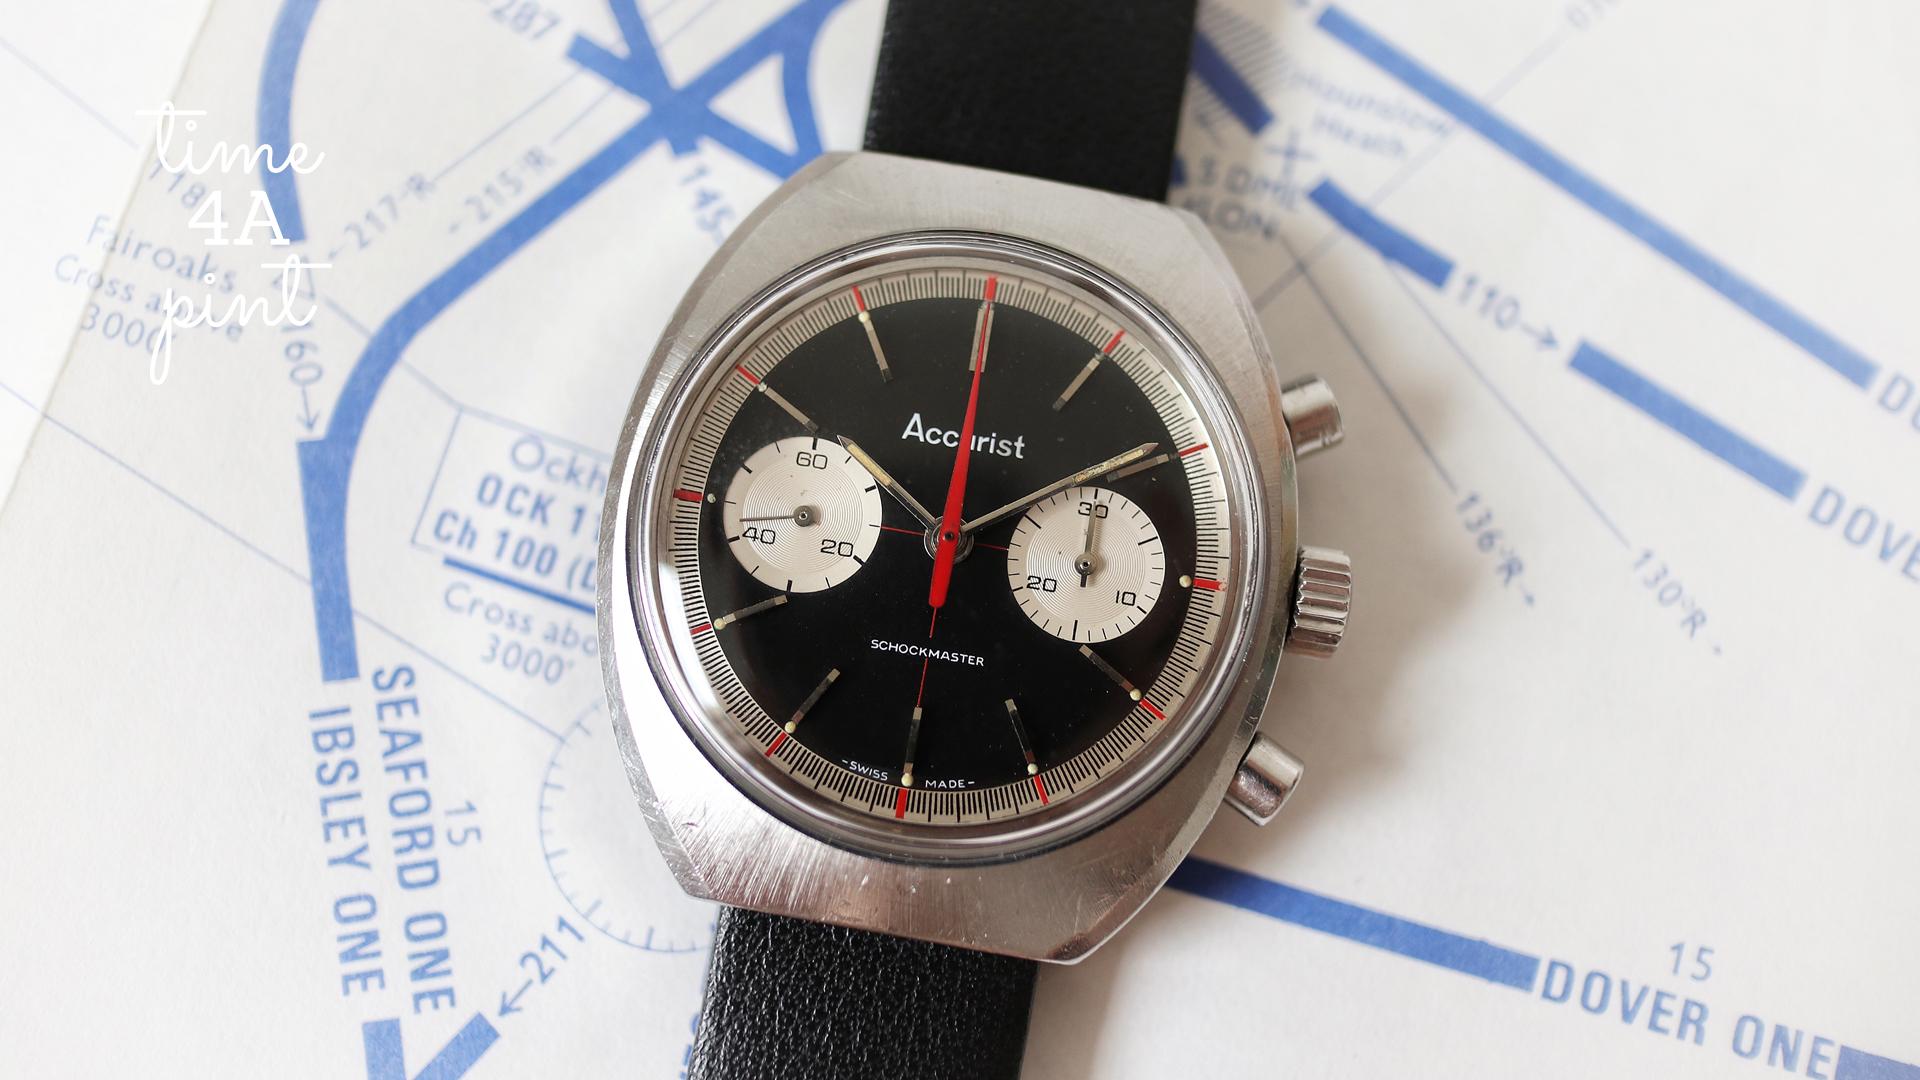 Accurist Schockmaster Chronograph